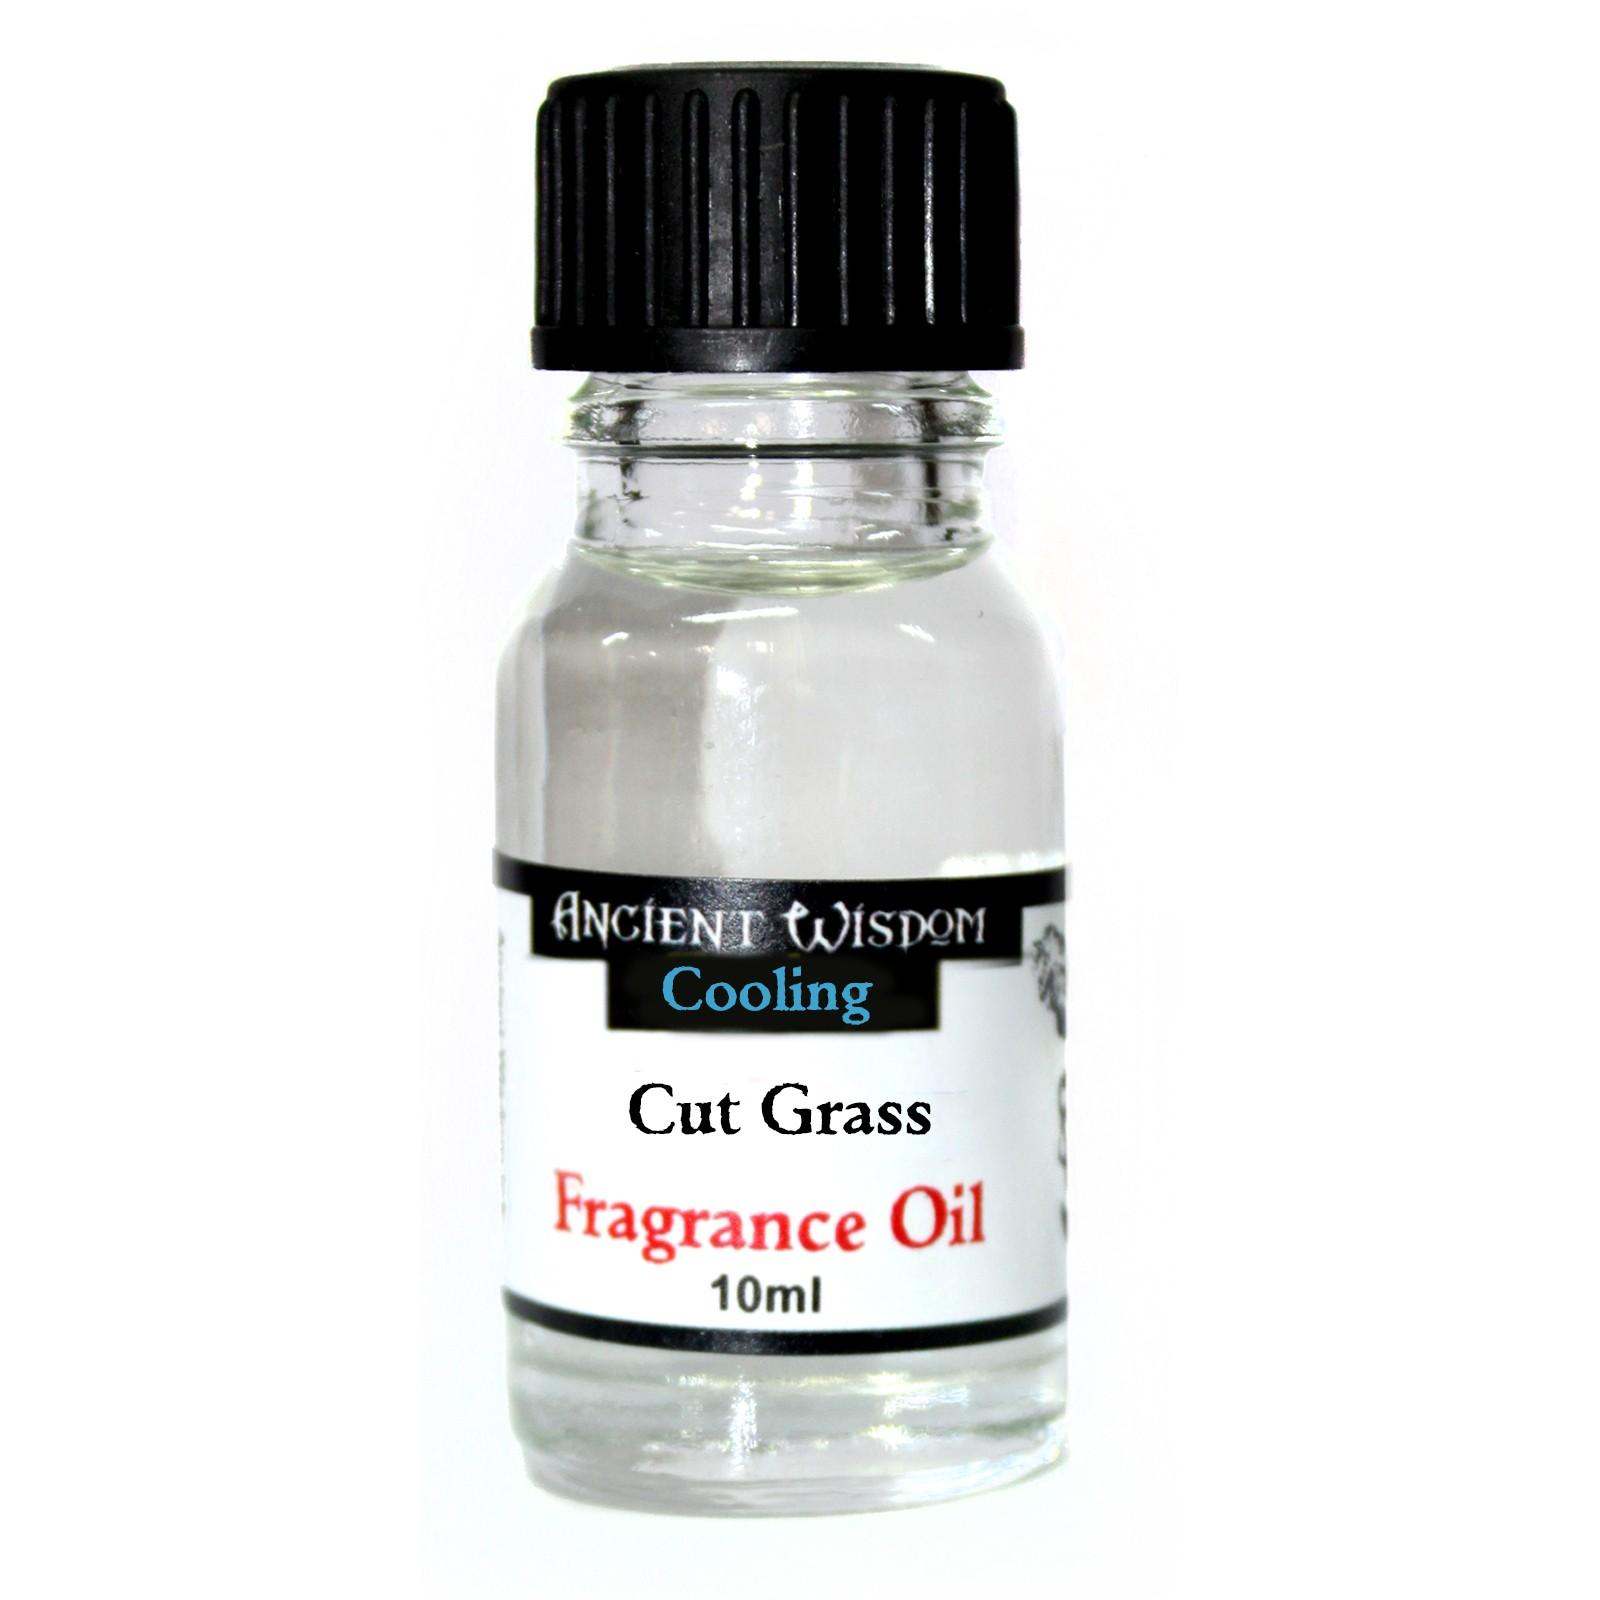 10ml Cut Grass Fragrance Oil